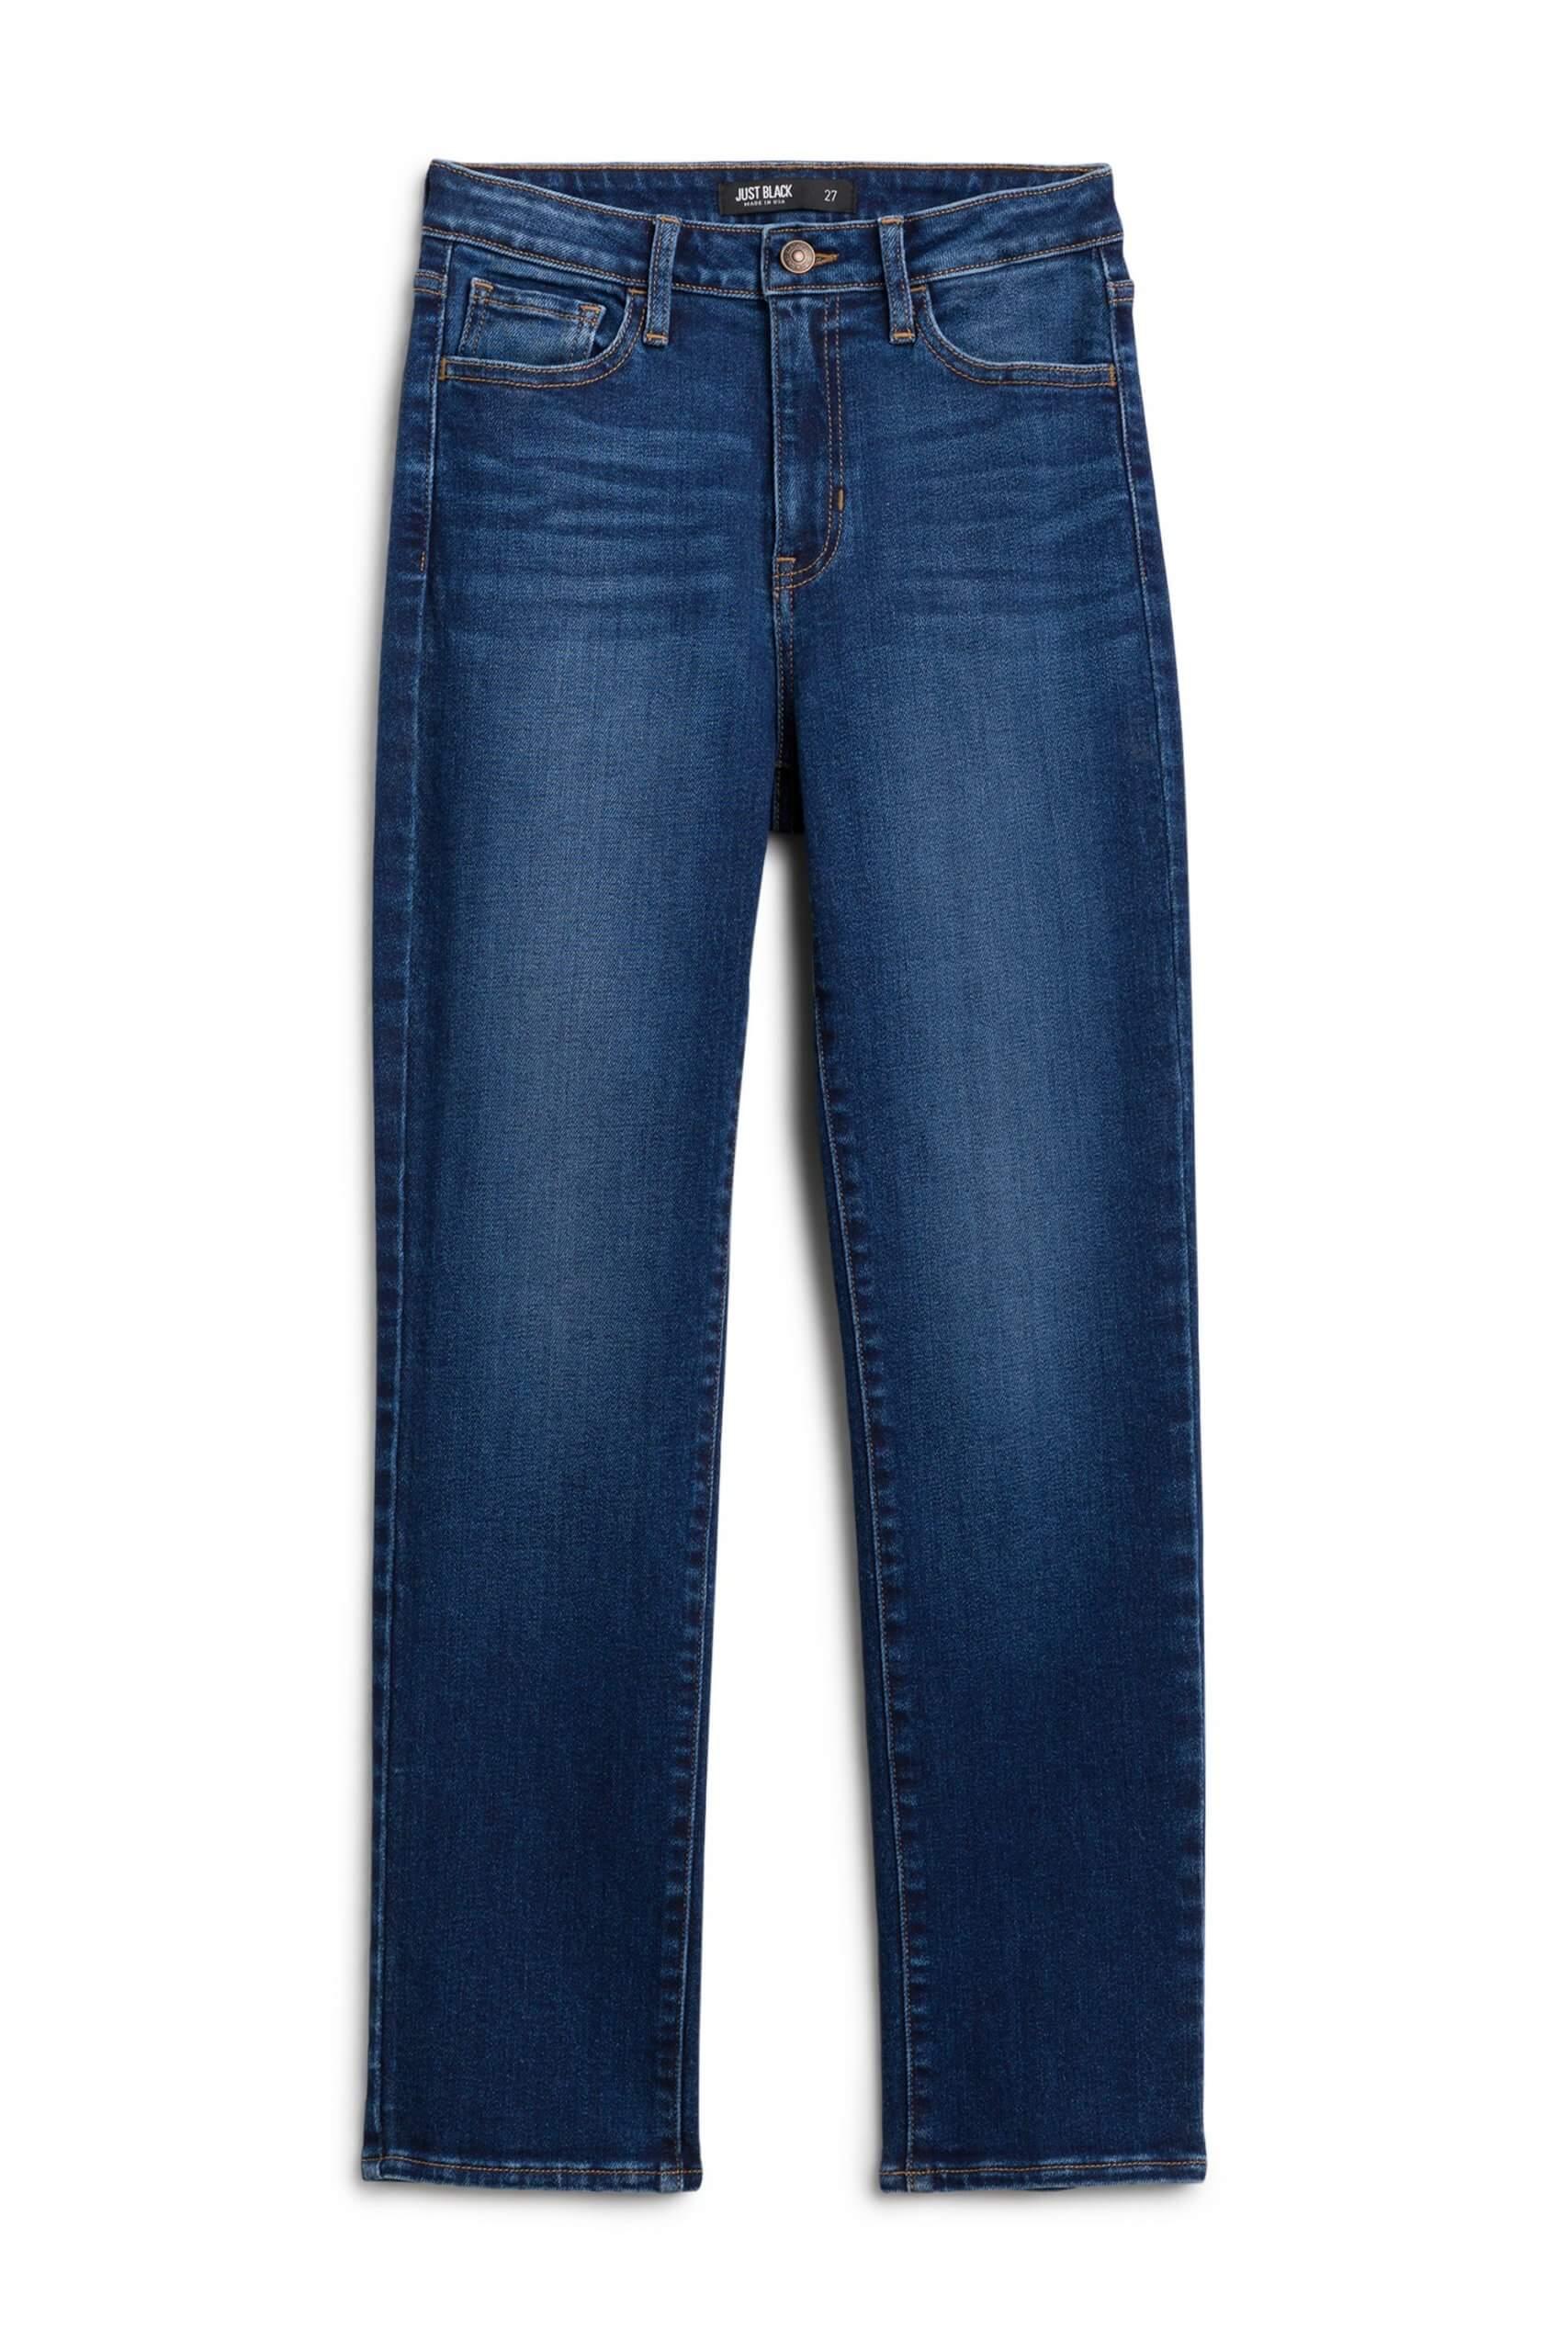 Stitch Fix Women's blue straight-fit jeans.